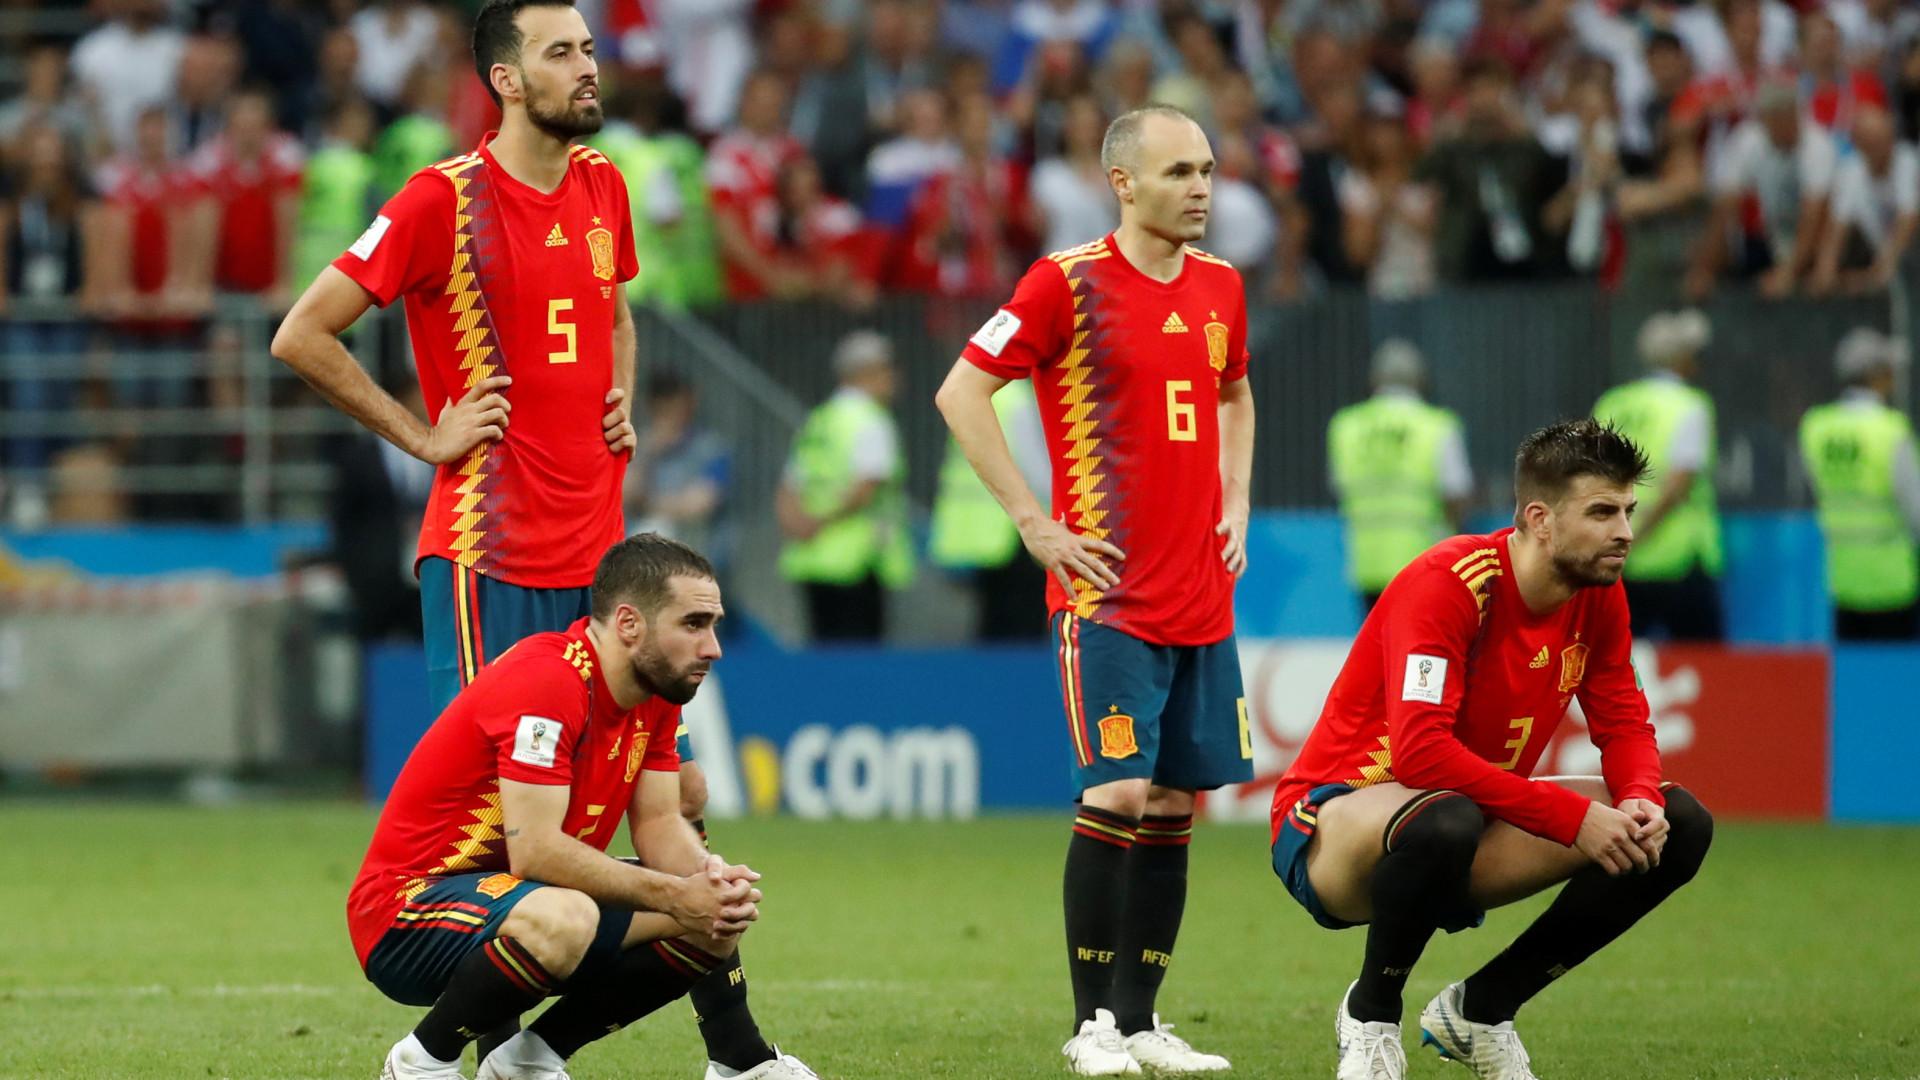 O futebolista espanhol Andrés Iniesta disse hoje 3f81089ff762d